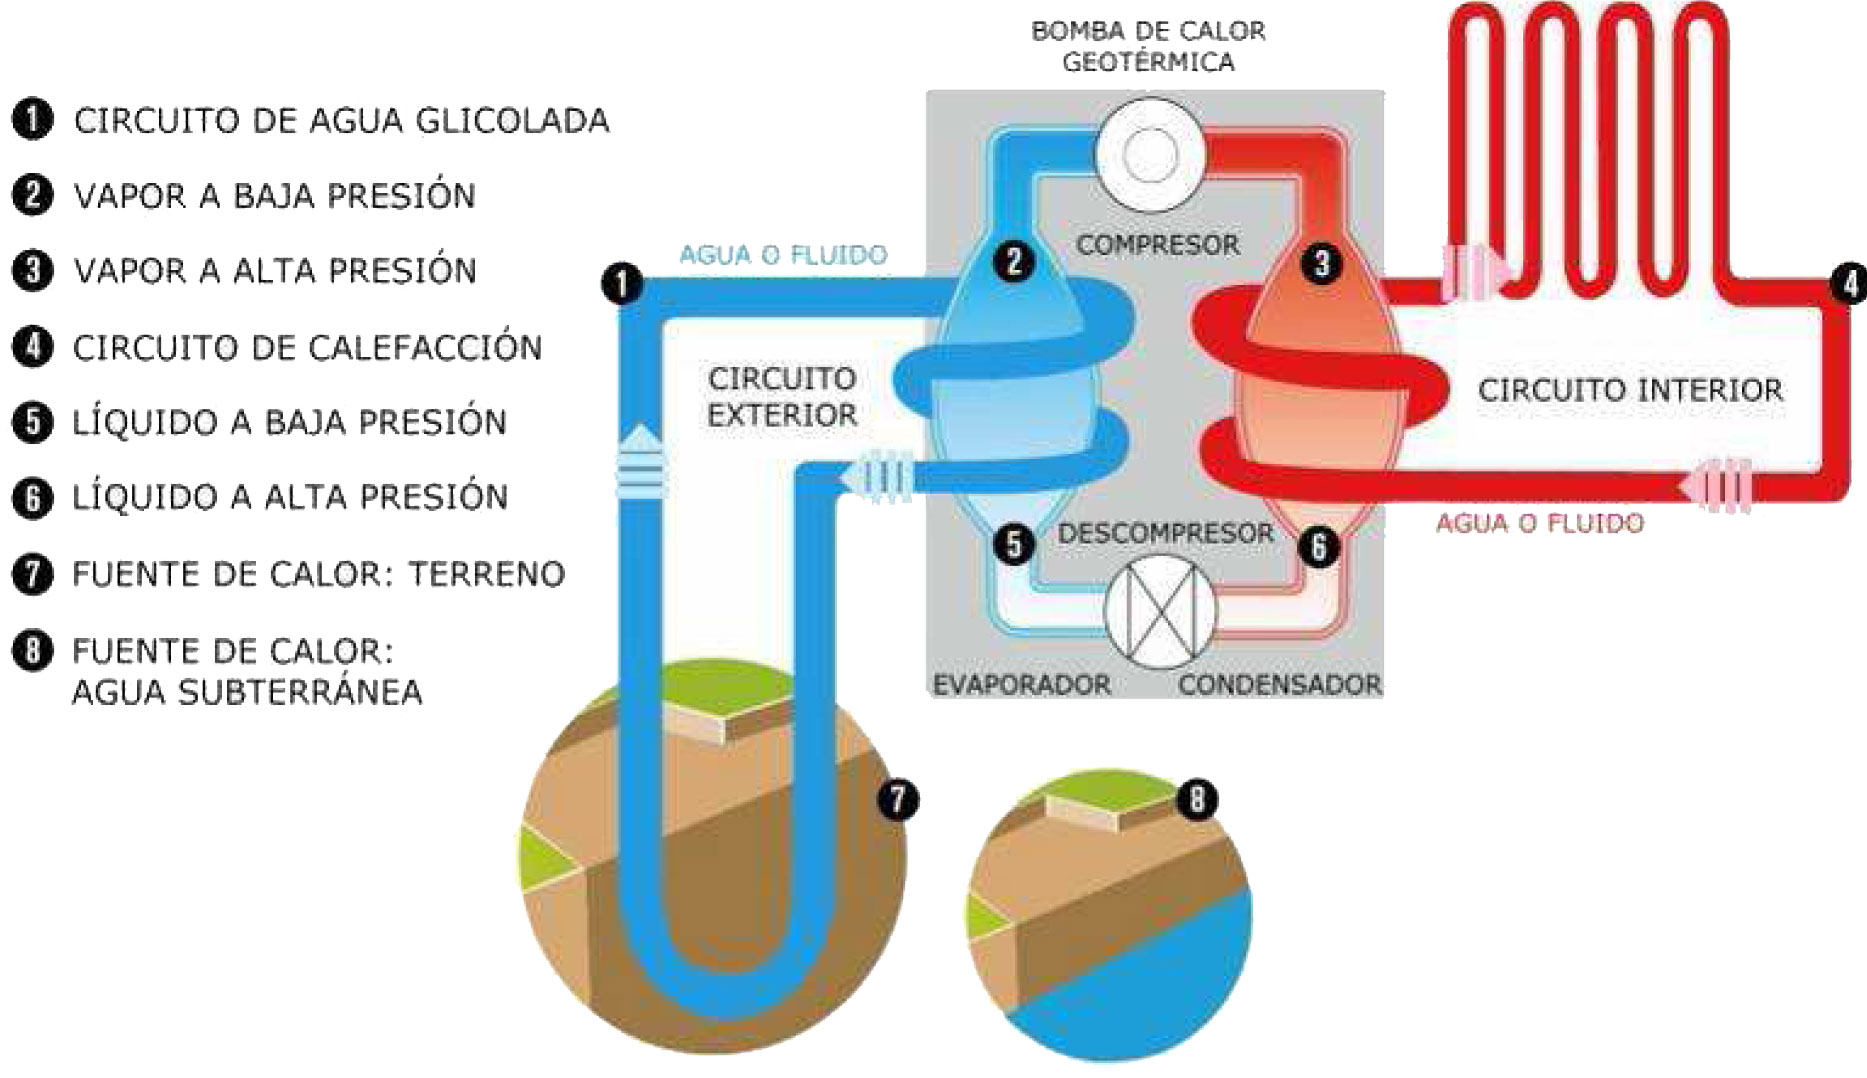 Geotermia bomba de calor transportes de paneles de madera - Bomba de calor ...